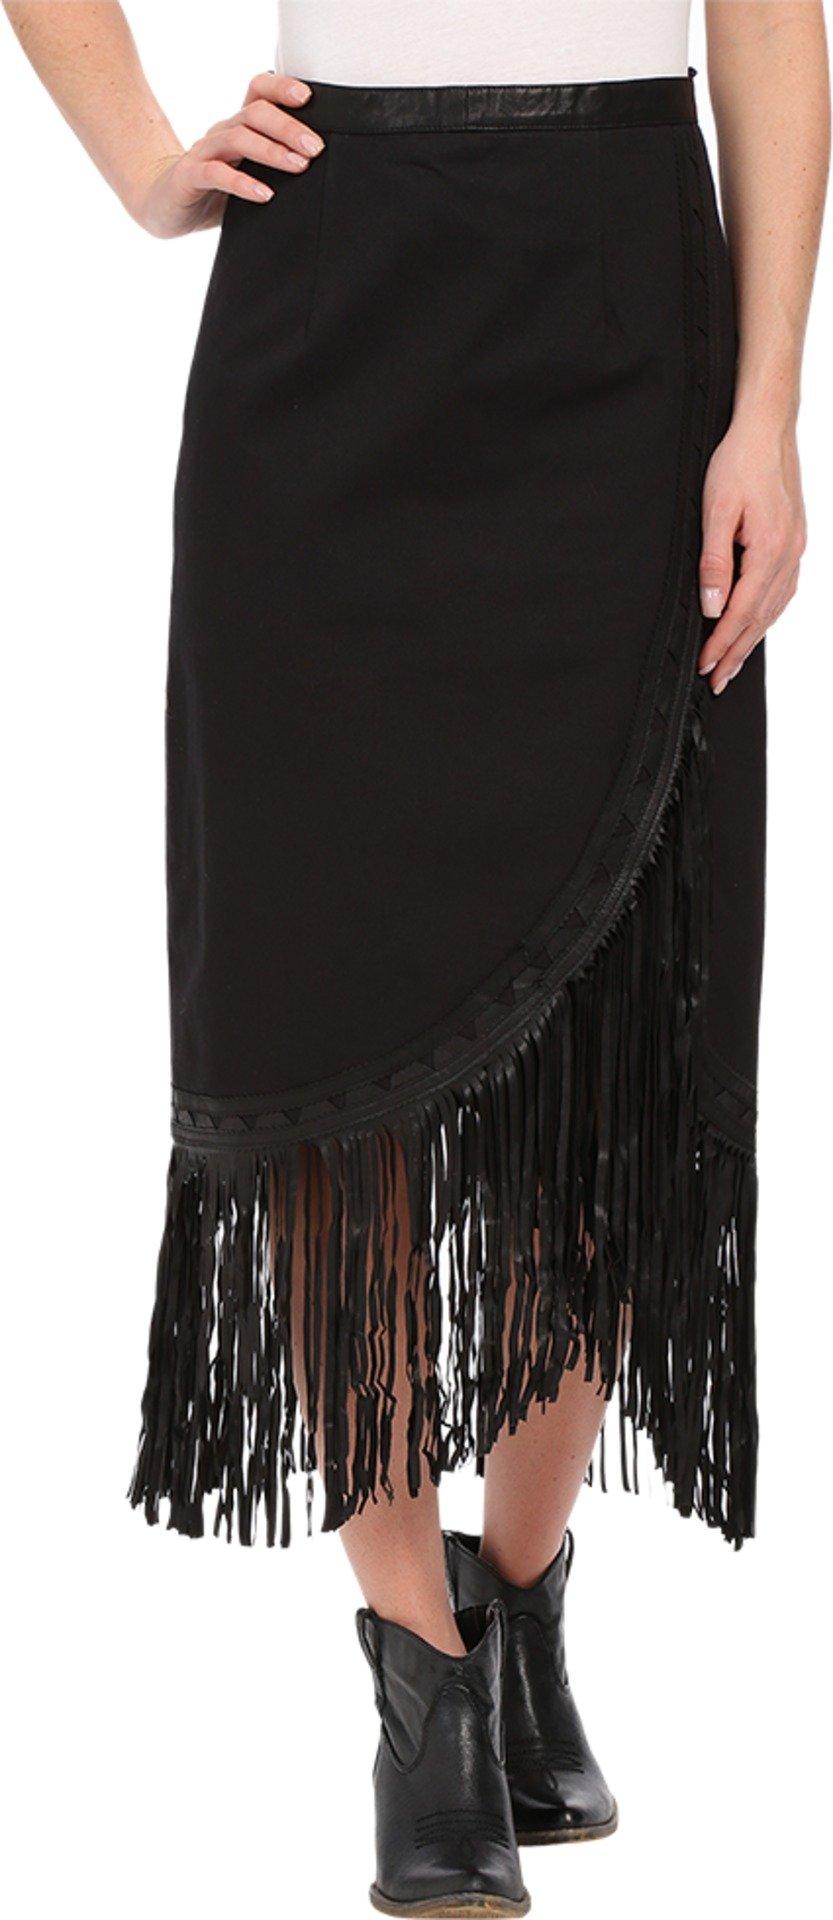 Tasha Polizzi Women's Trail Skirt Black Skirt MD by Tasha Polizzi (Image #1)